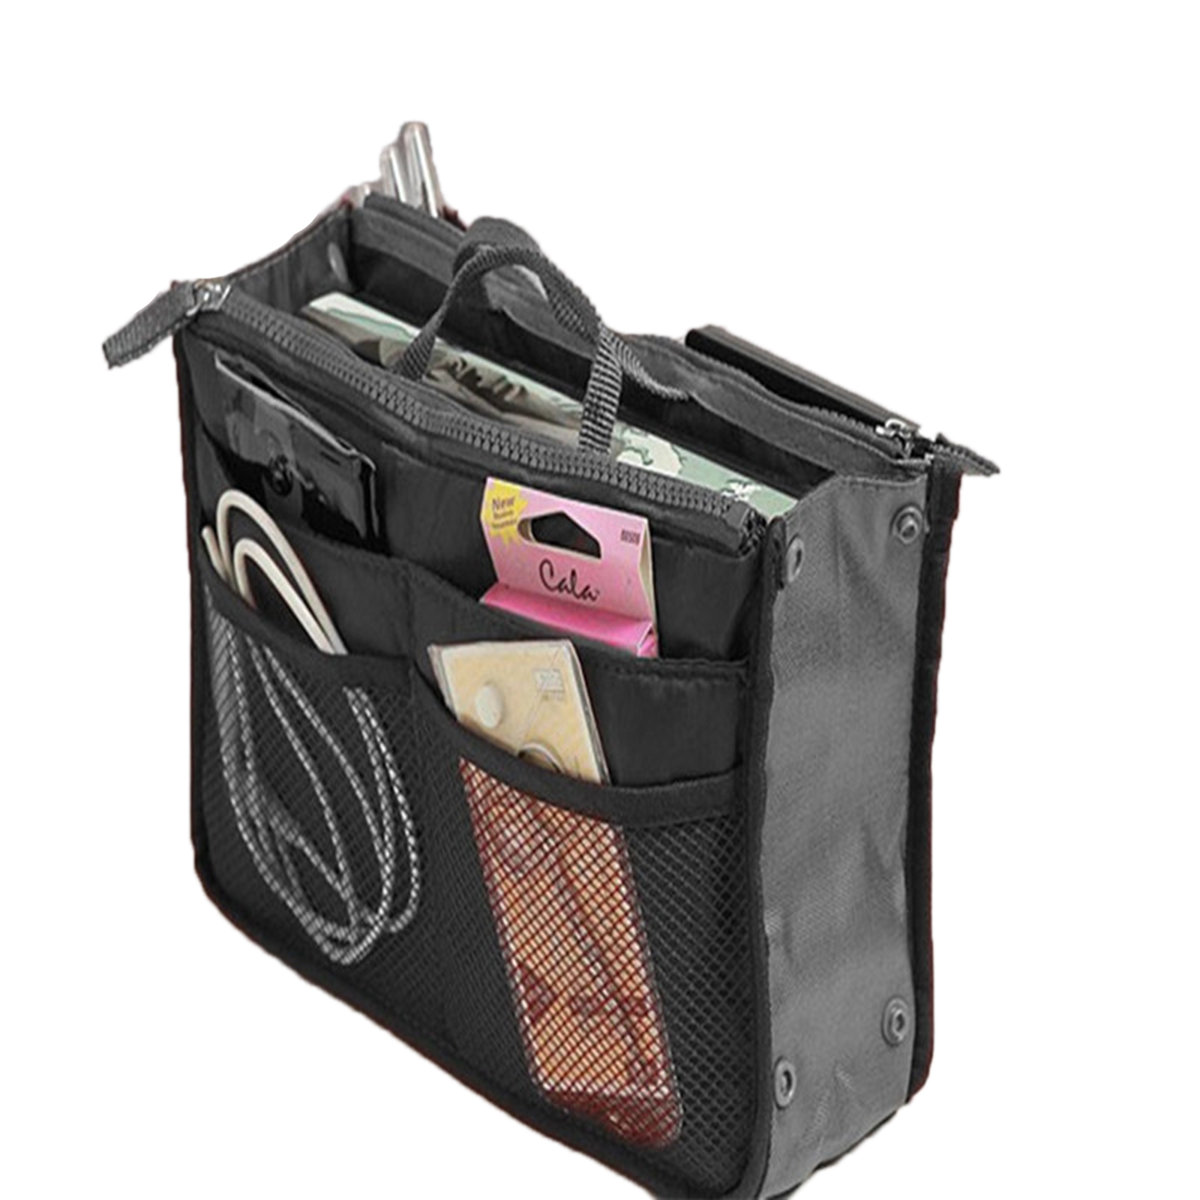 Organizer Handbag Foldable Portable Waterproof Storage Bag Double Zipper Travel Storage Holder Cosmetics Suitcase Pouch